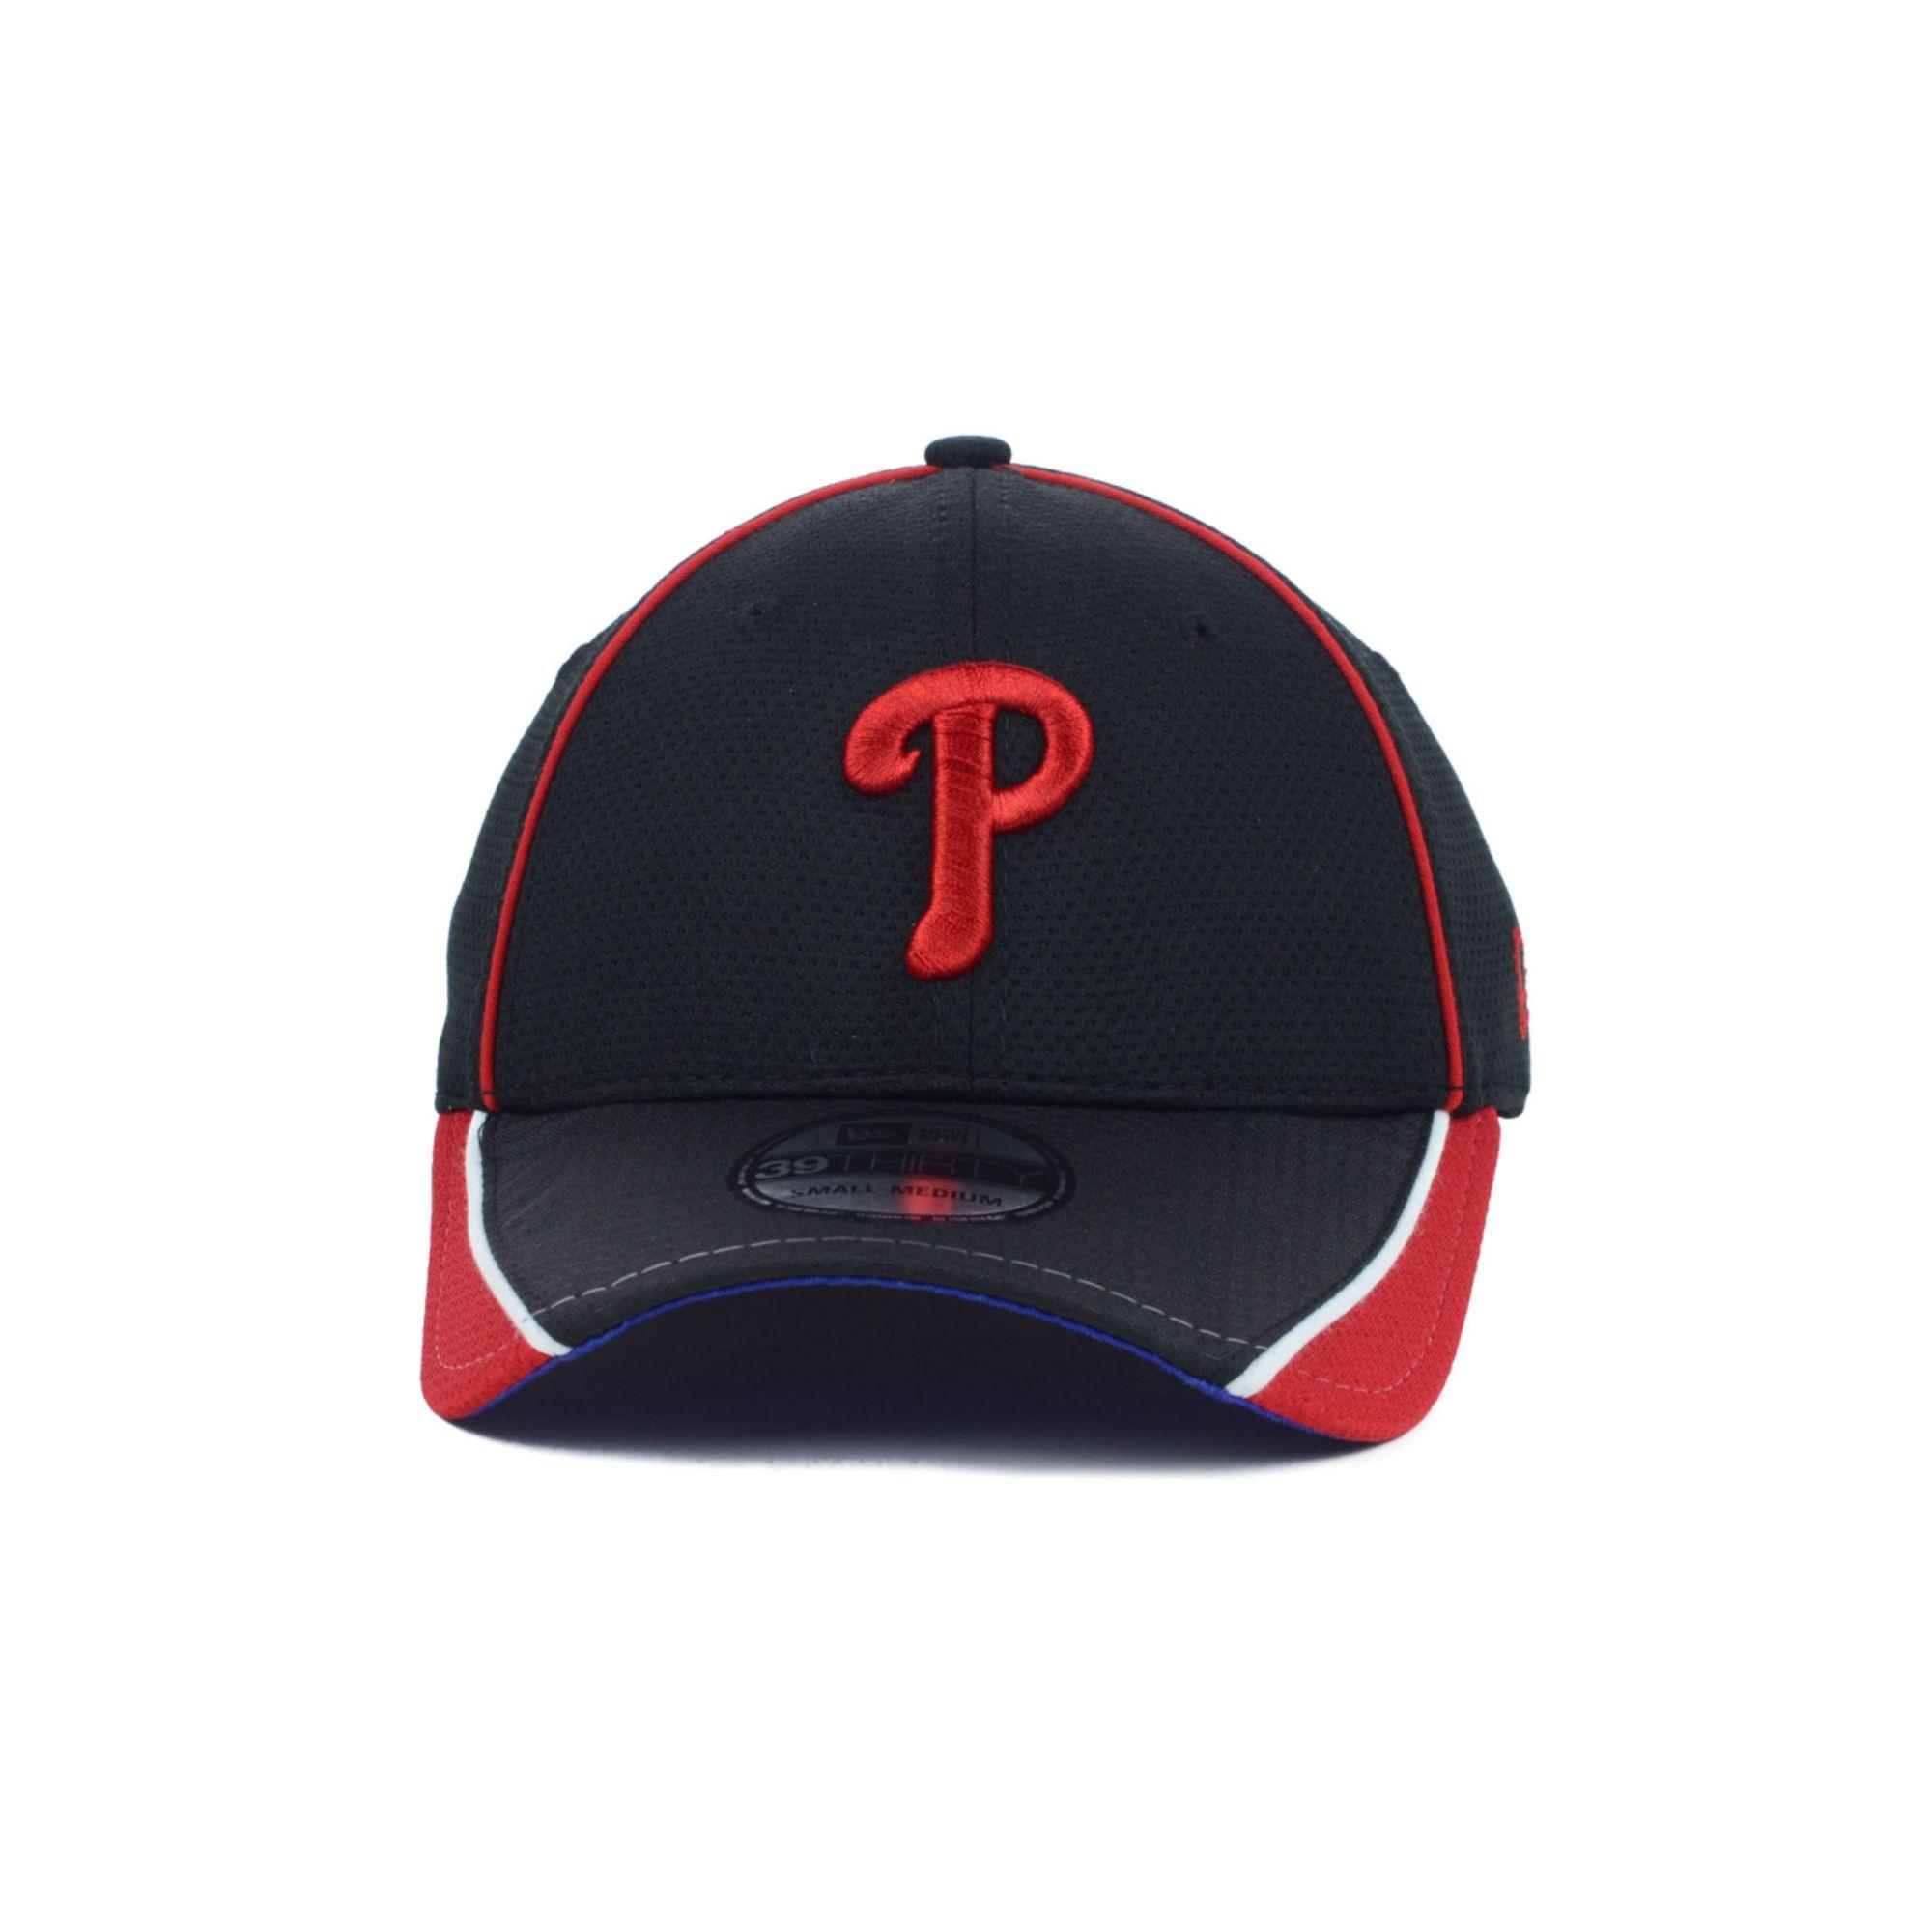 Lyst - Ktz Philadelphia Phillies Mlb Pipe Slide 39thirty Cap in Red ... f7c297ad1b5b